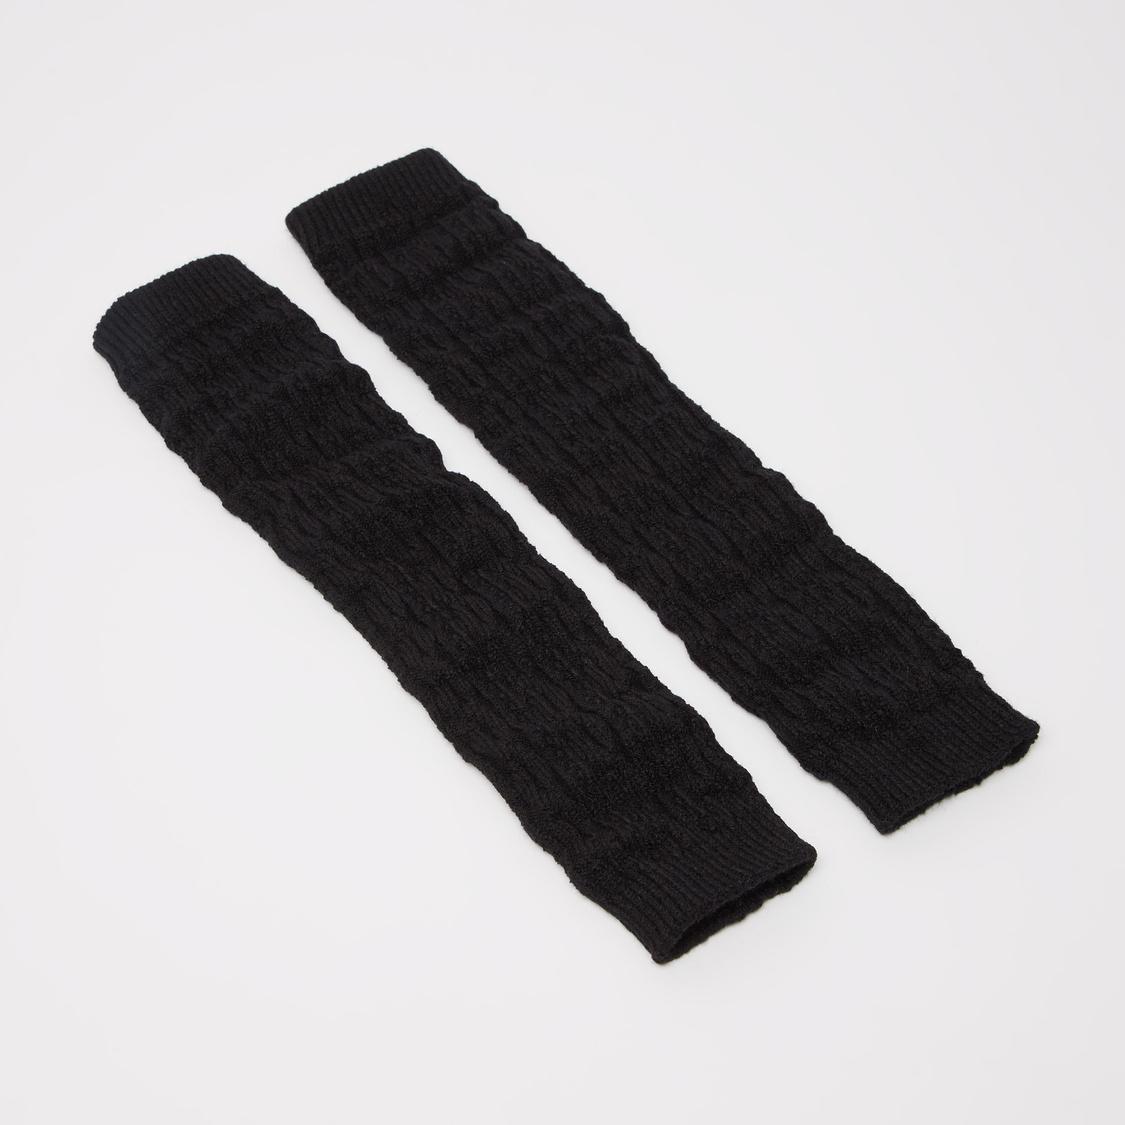 Textured Leg Warmers